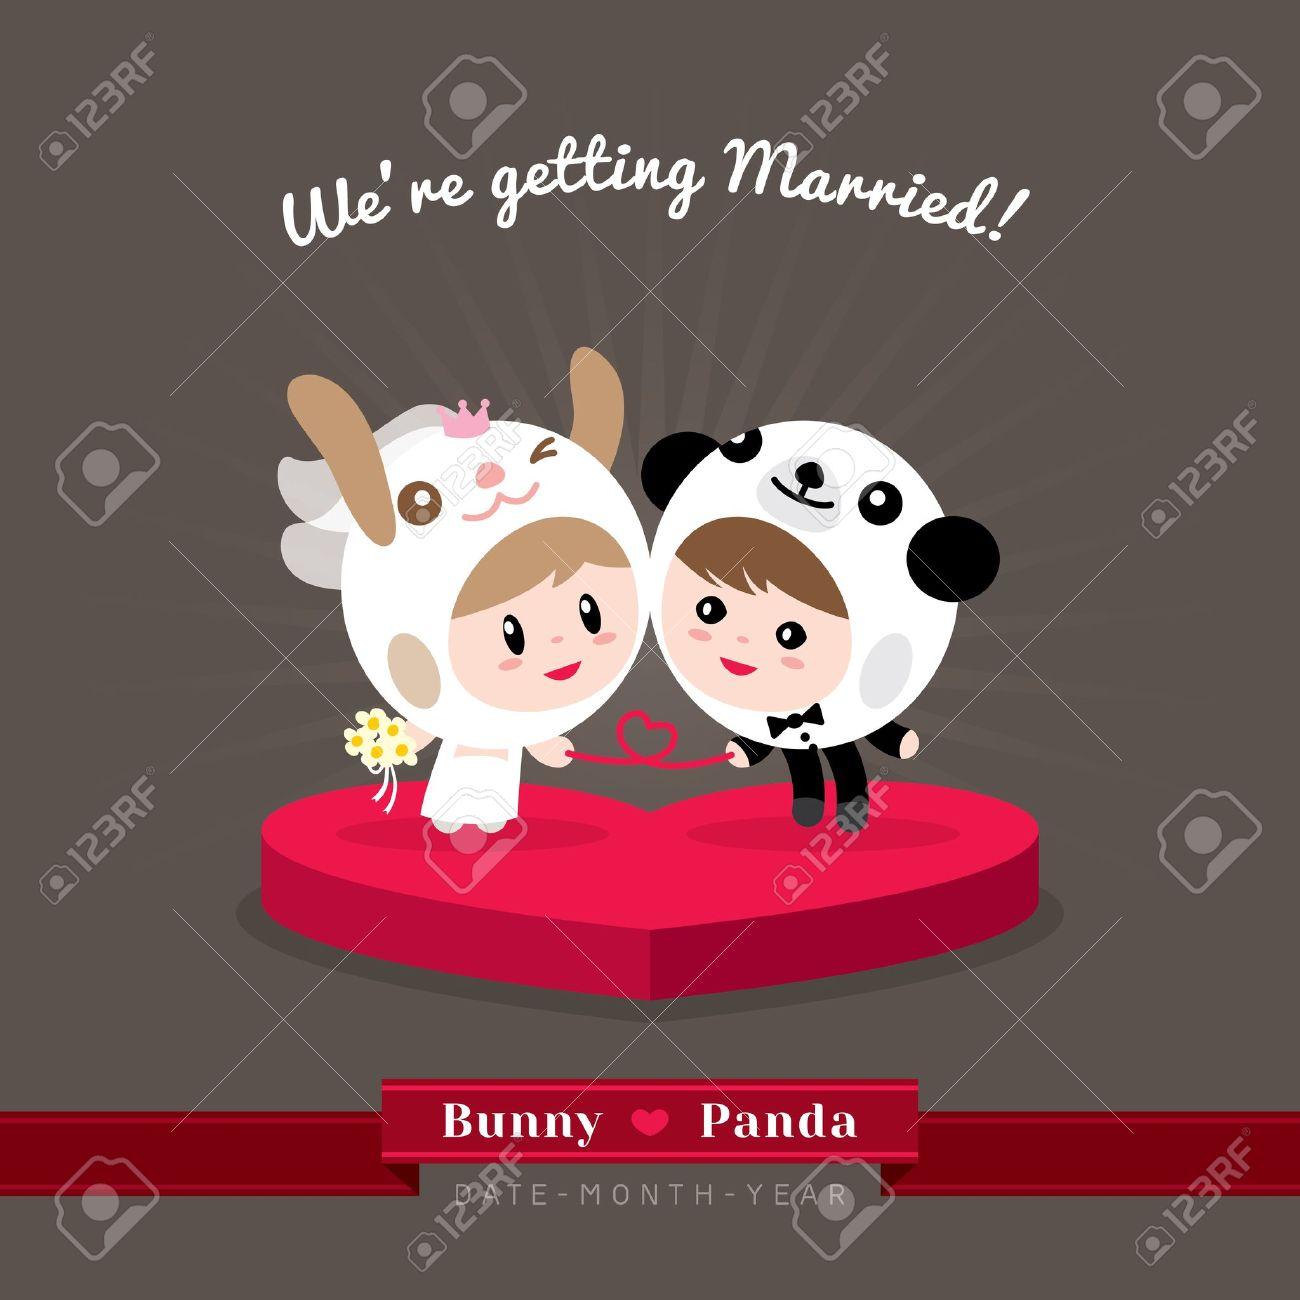 Cute kawaii groom and bride character in rabbit and panda helmet